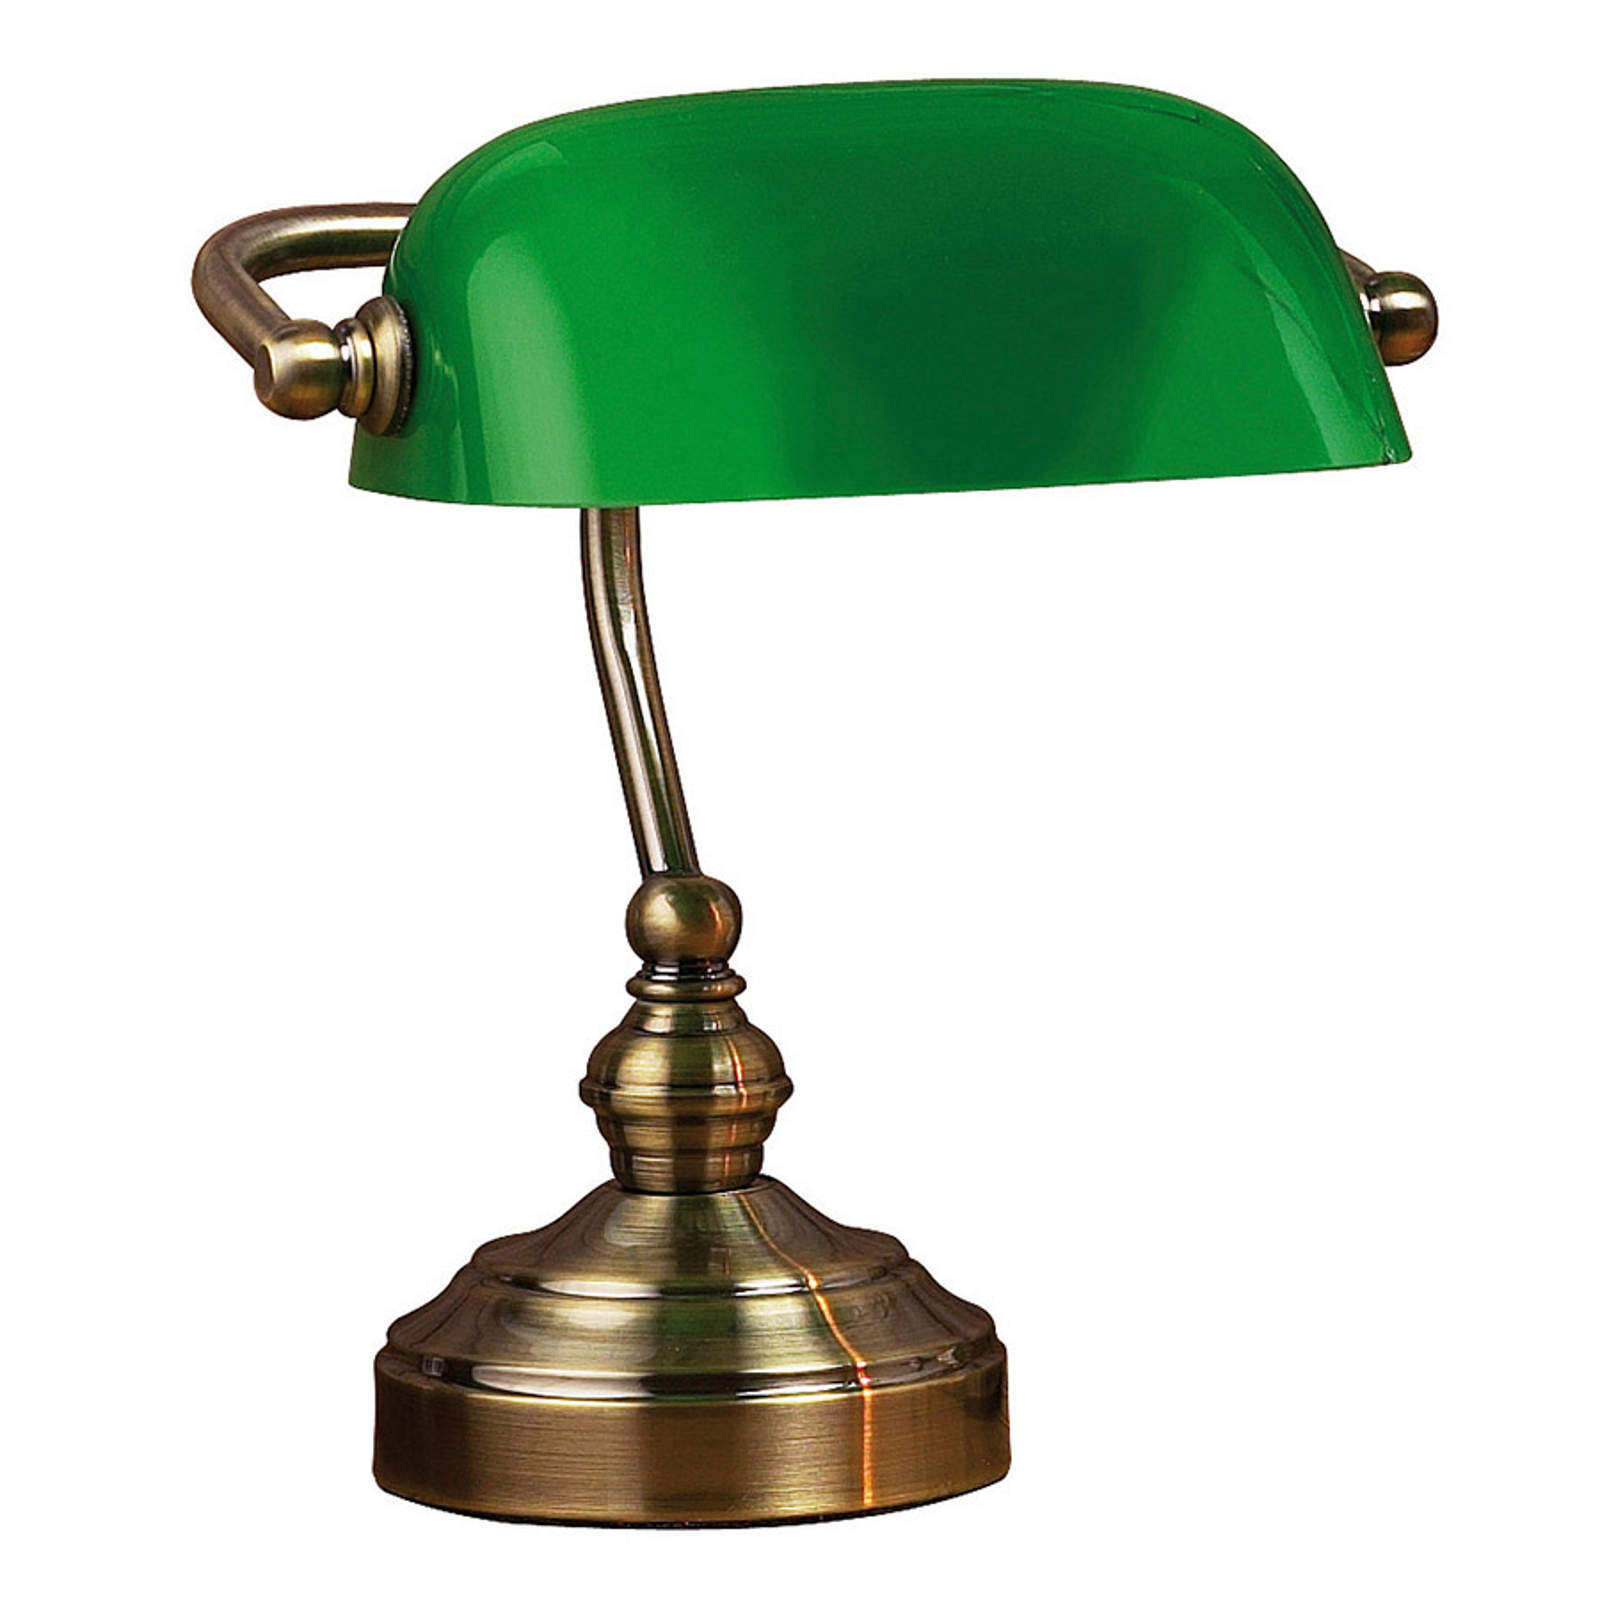 Bordslampa Bankers, höjd 25 cm grön